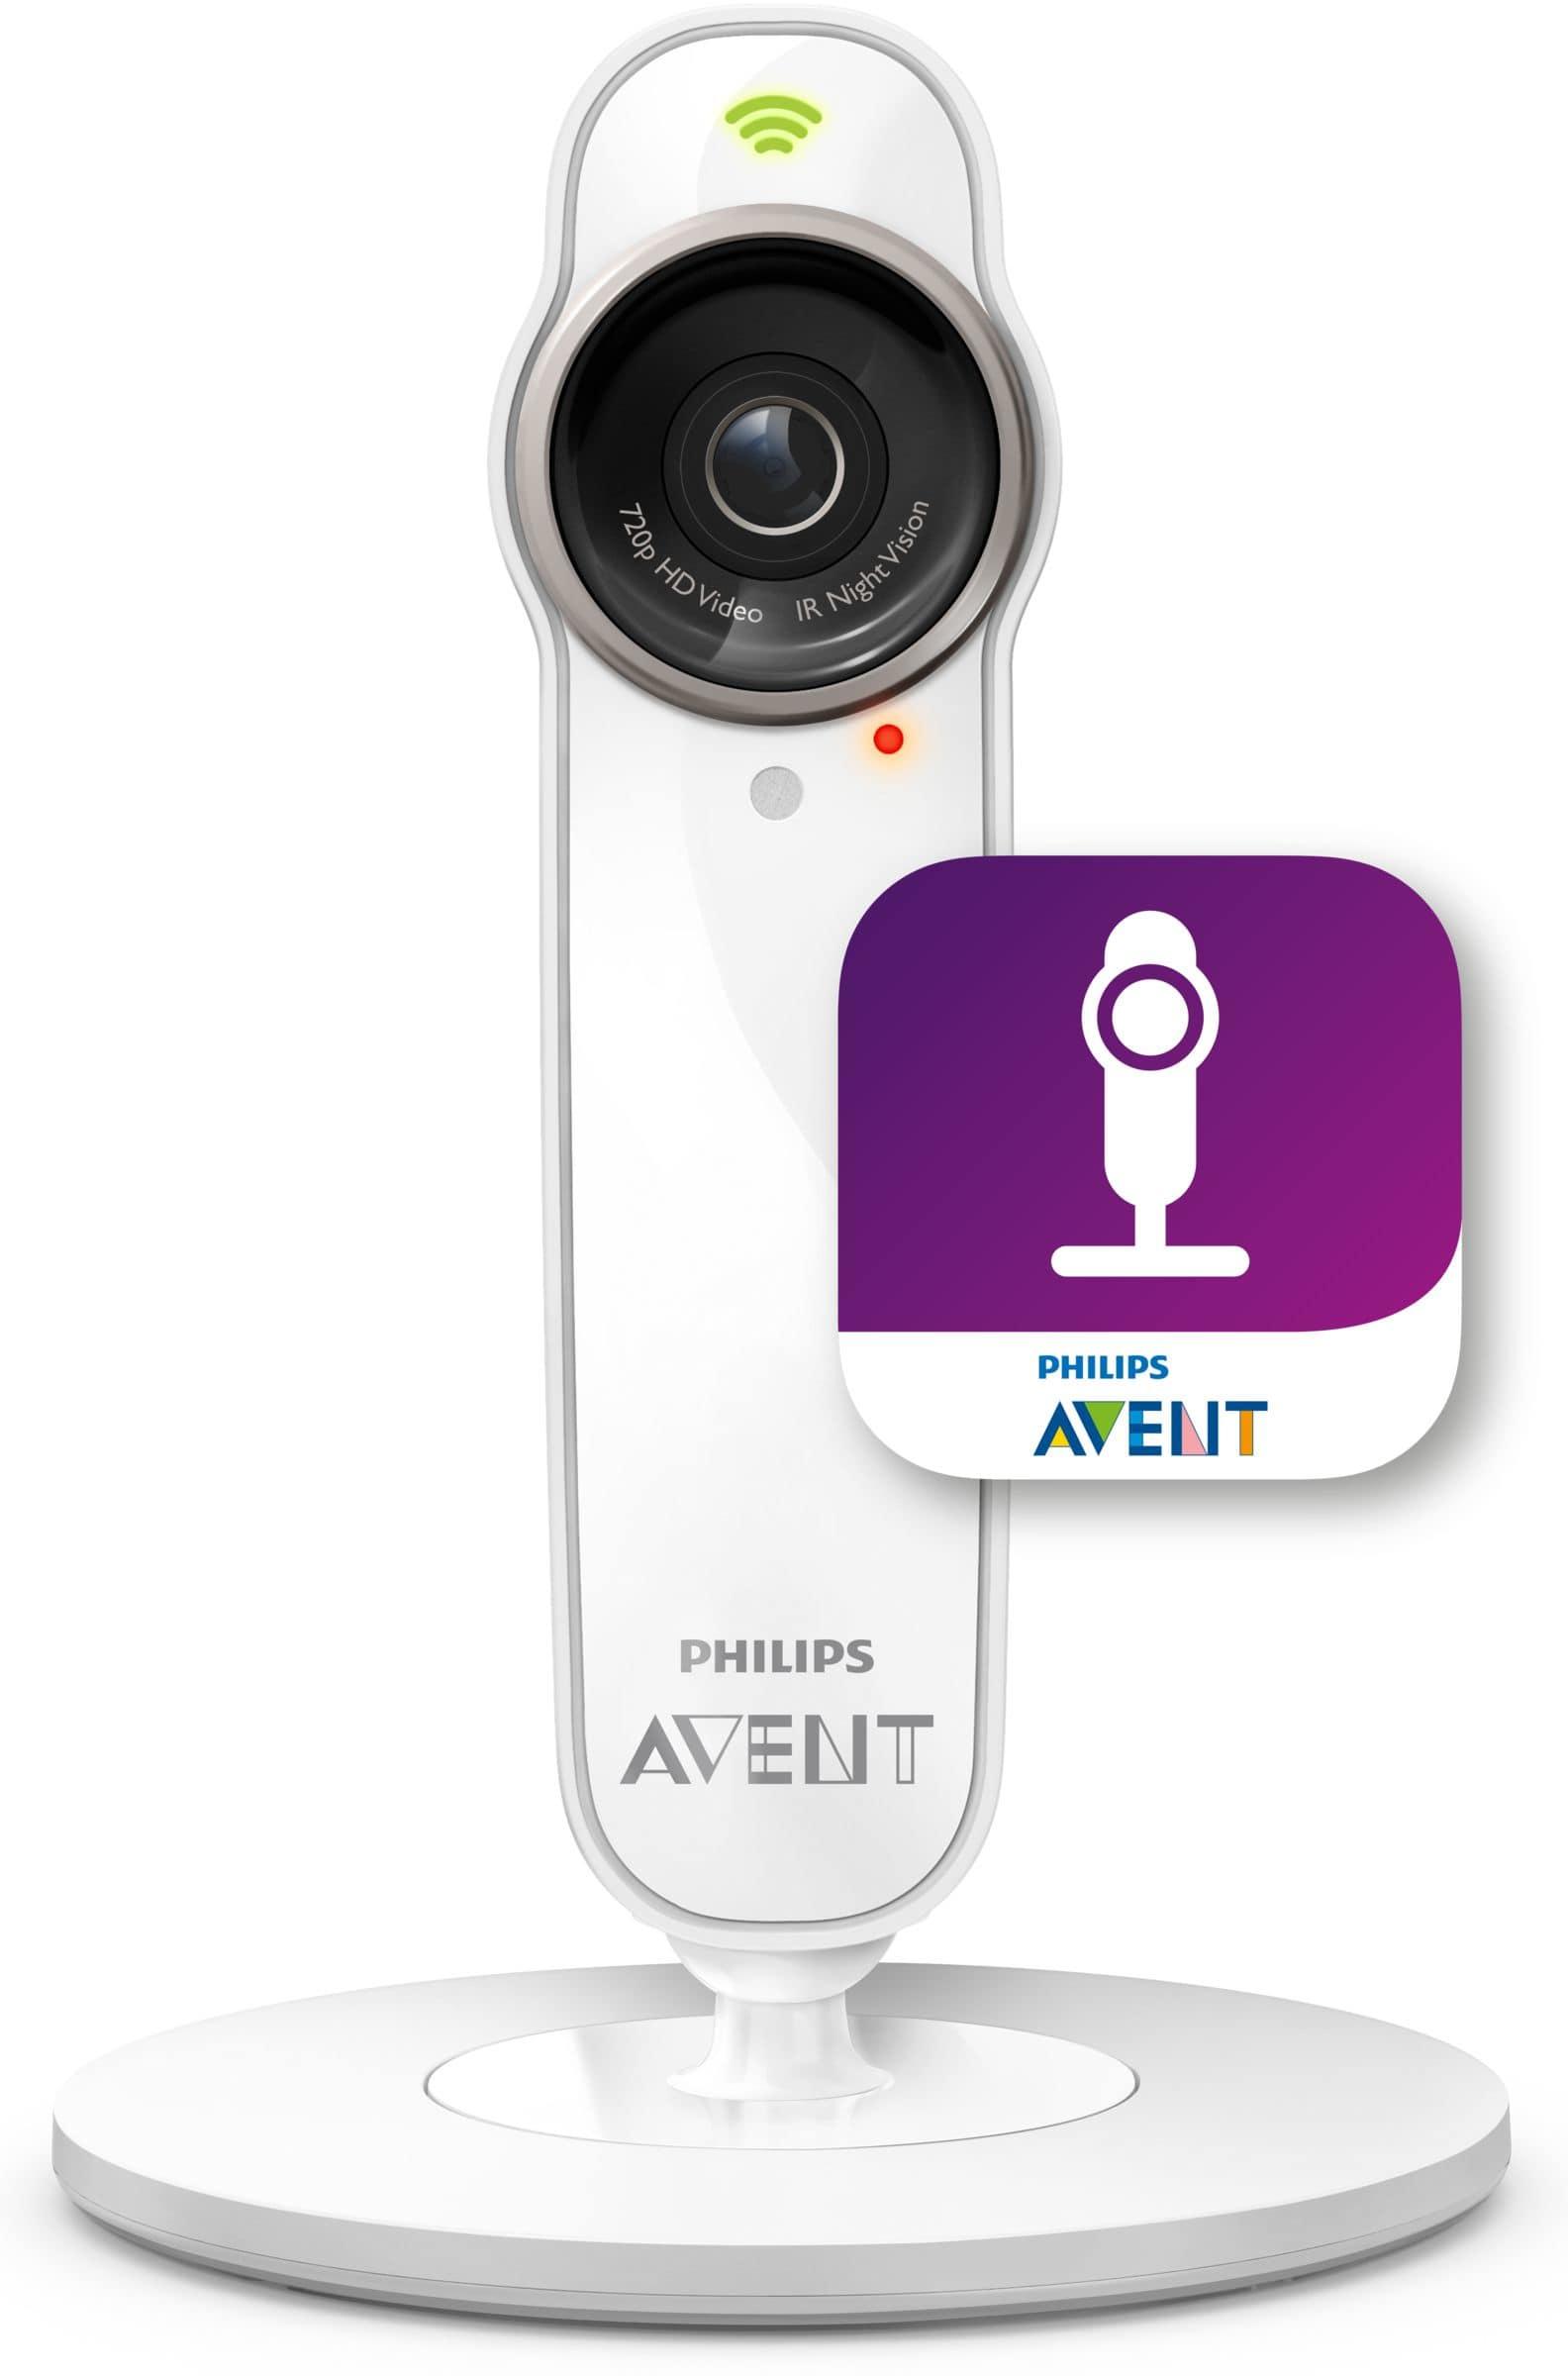 Philips AVENT Avent uGrow CD870/26 Smart Babyphone SafeConnect Technology Nachtmodus für 219,99 Euro